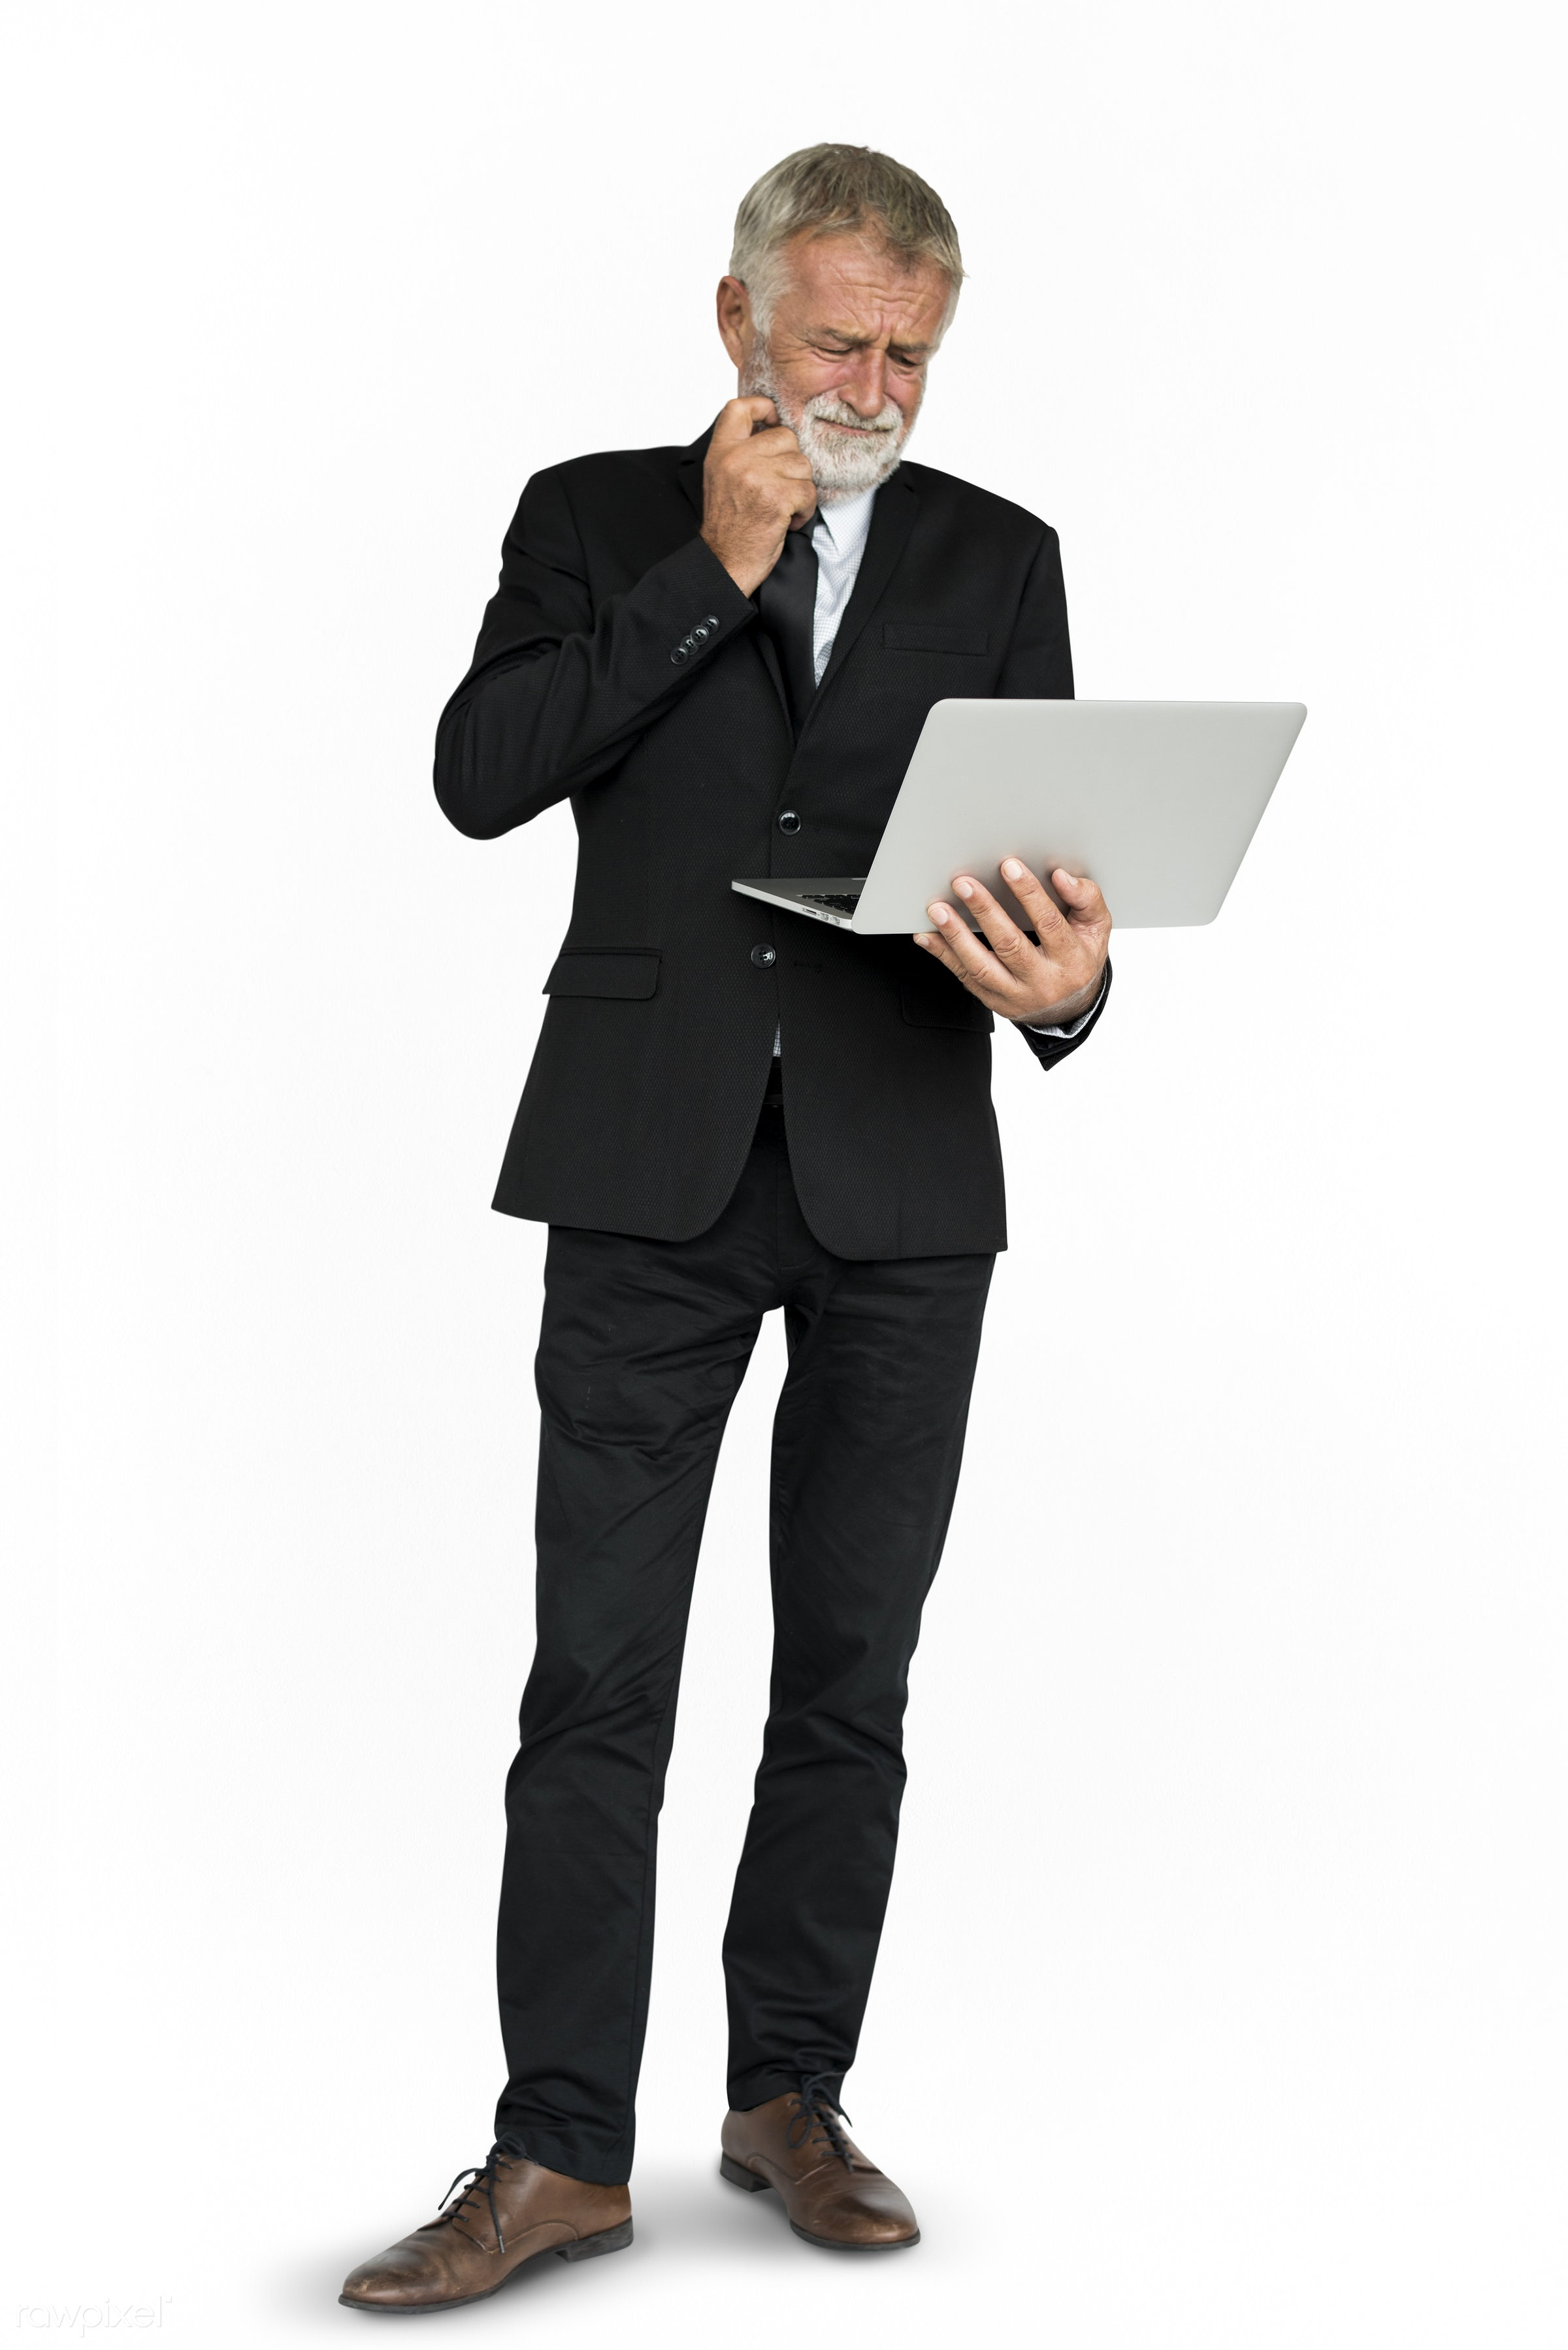 isolated on white, business, elderly, hold, holding, laptop, man, senior, suit, thinking, work, working